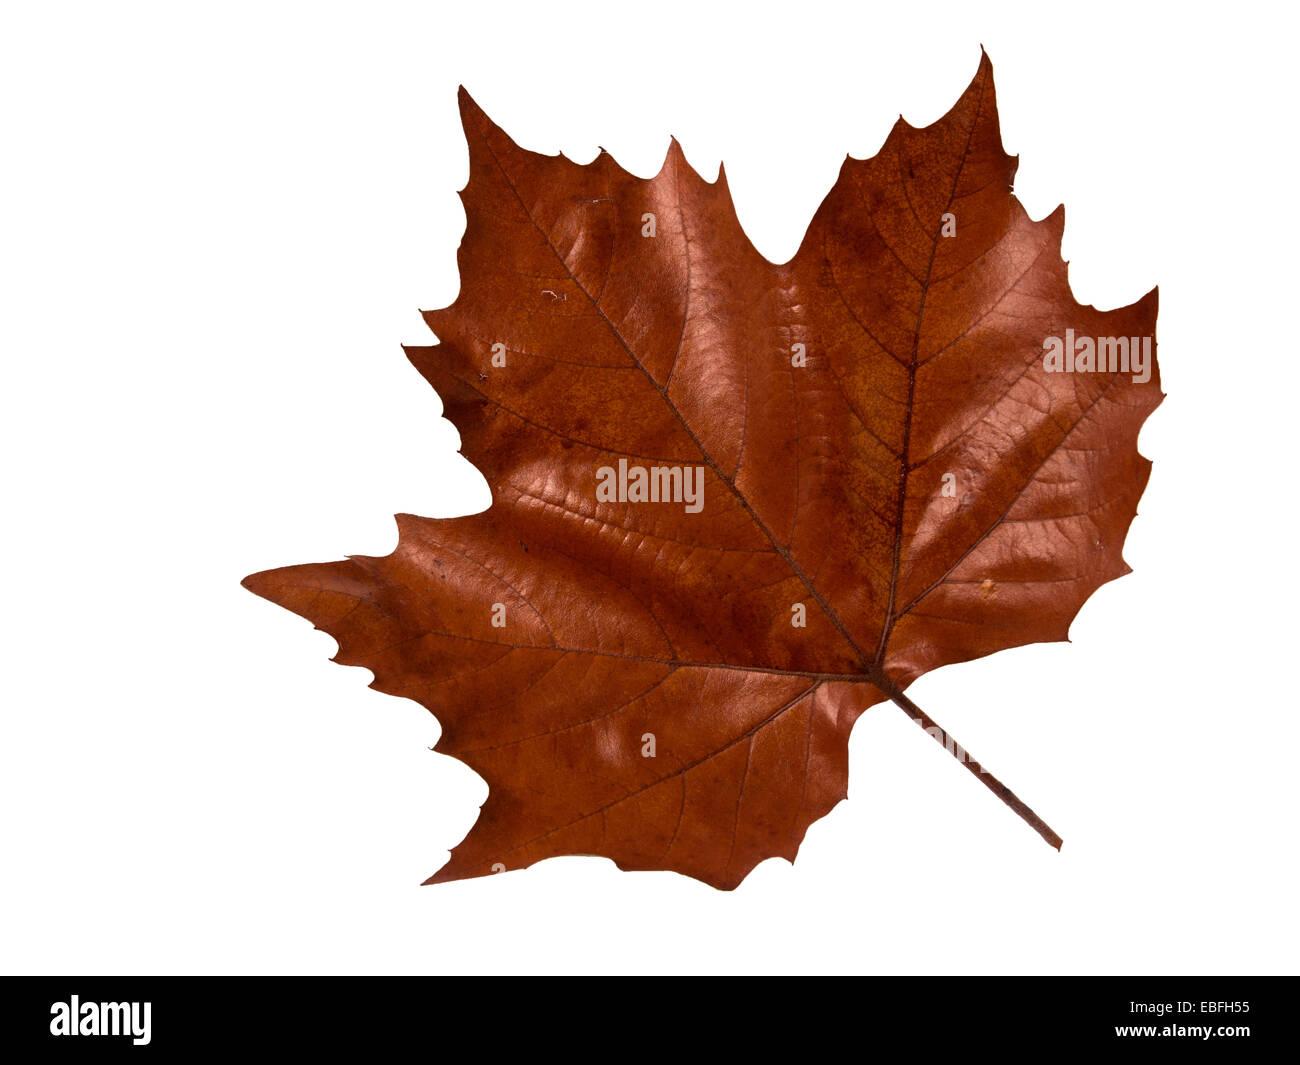 Maple Leave - Autumn Stock Photo